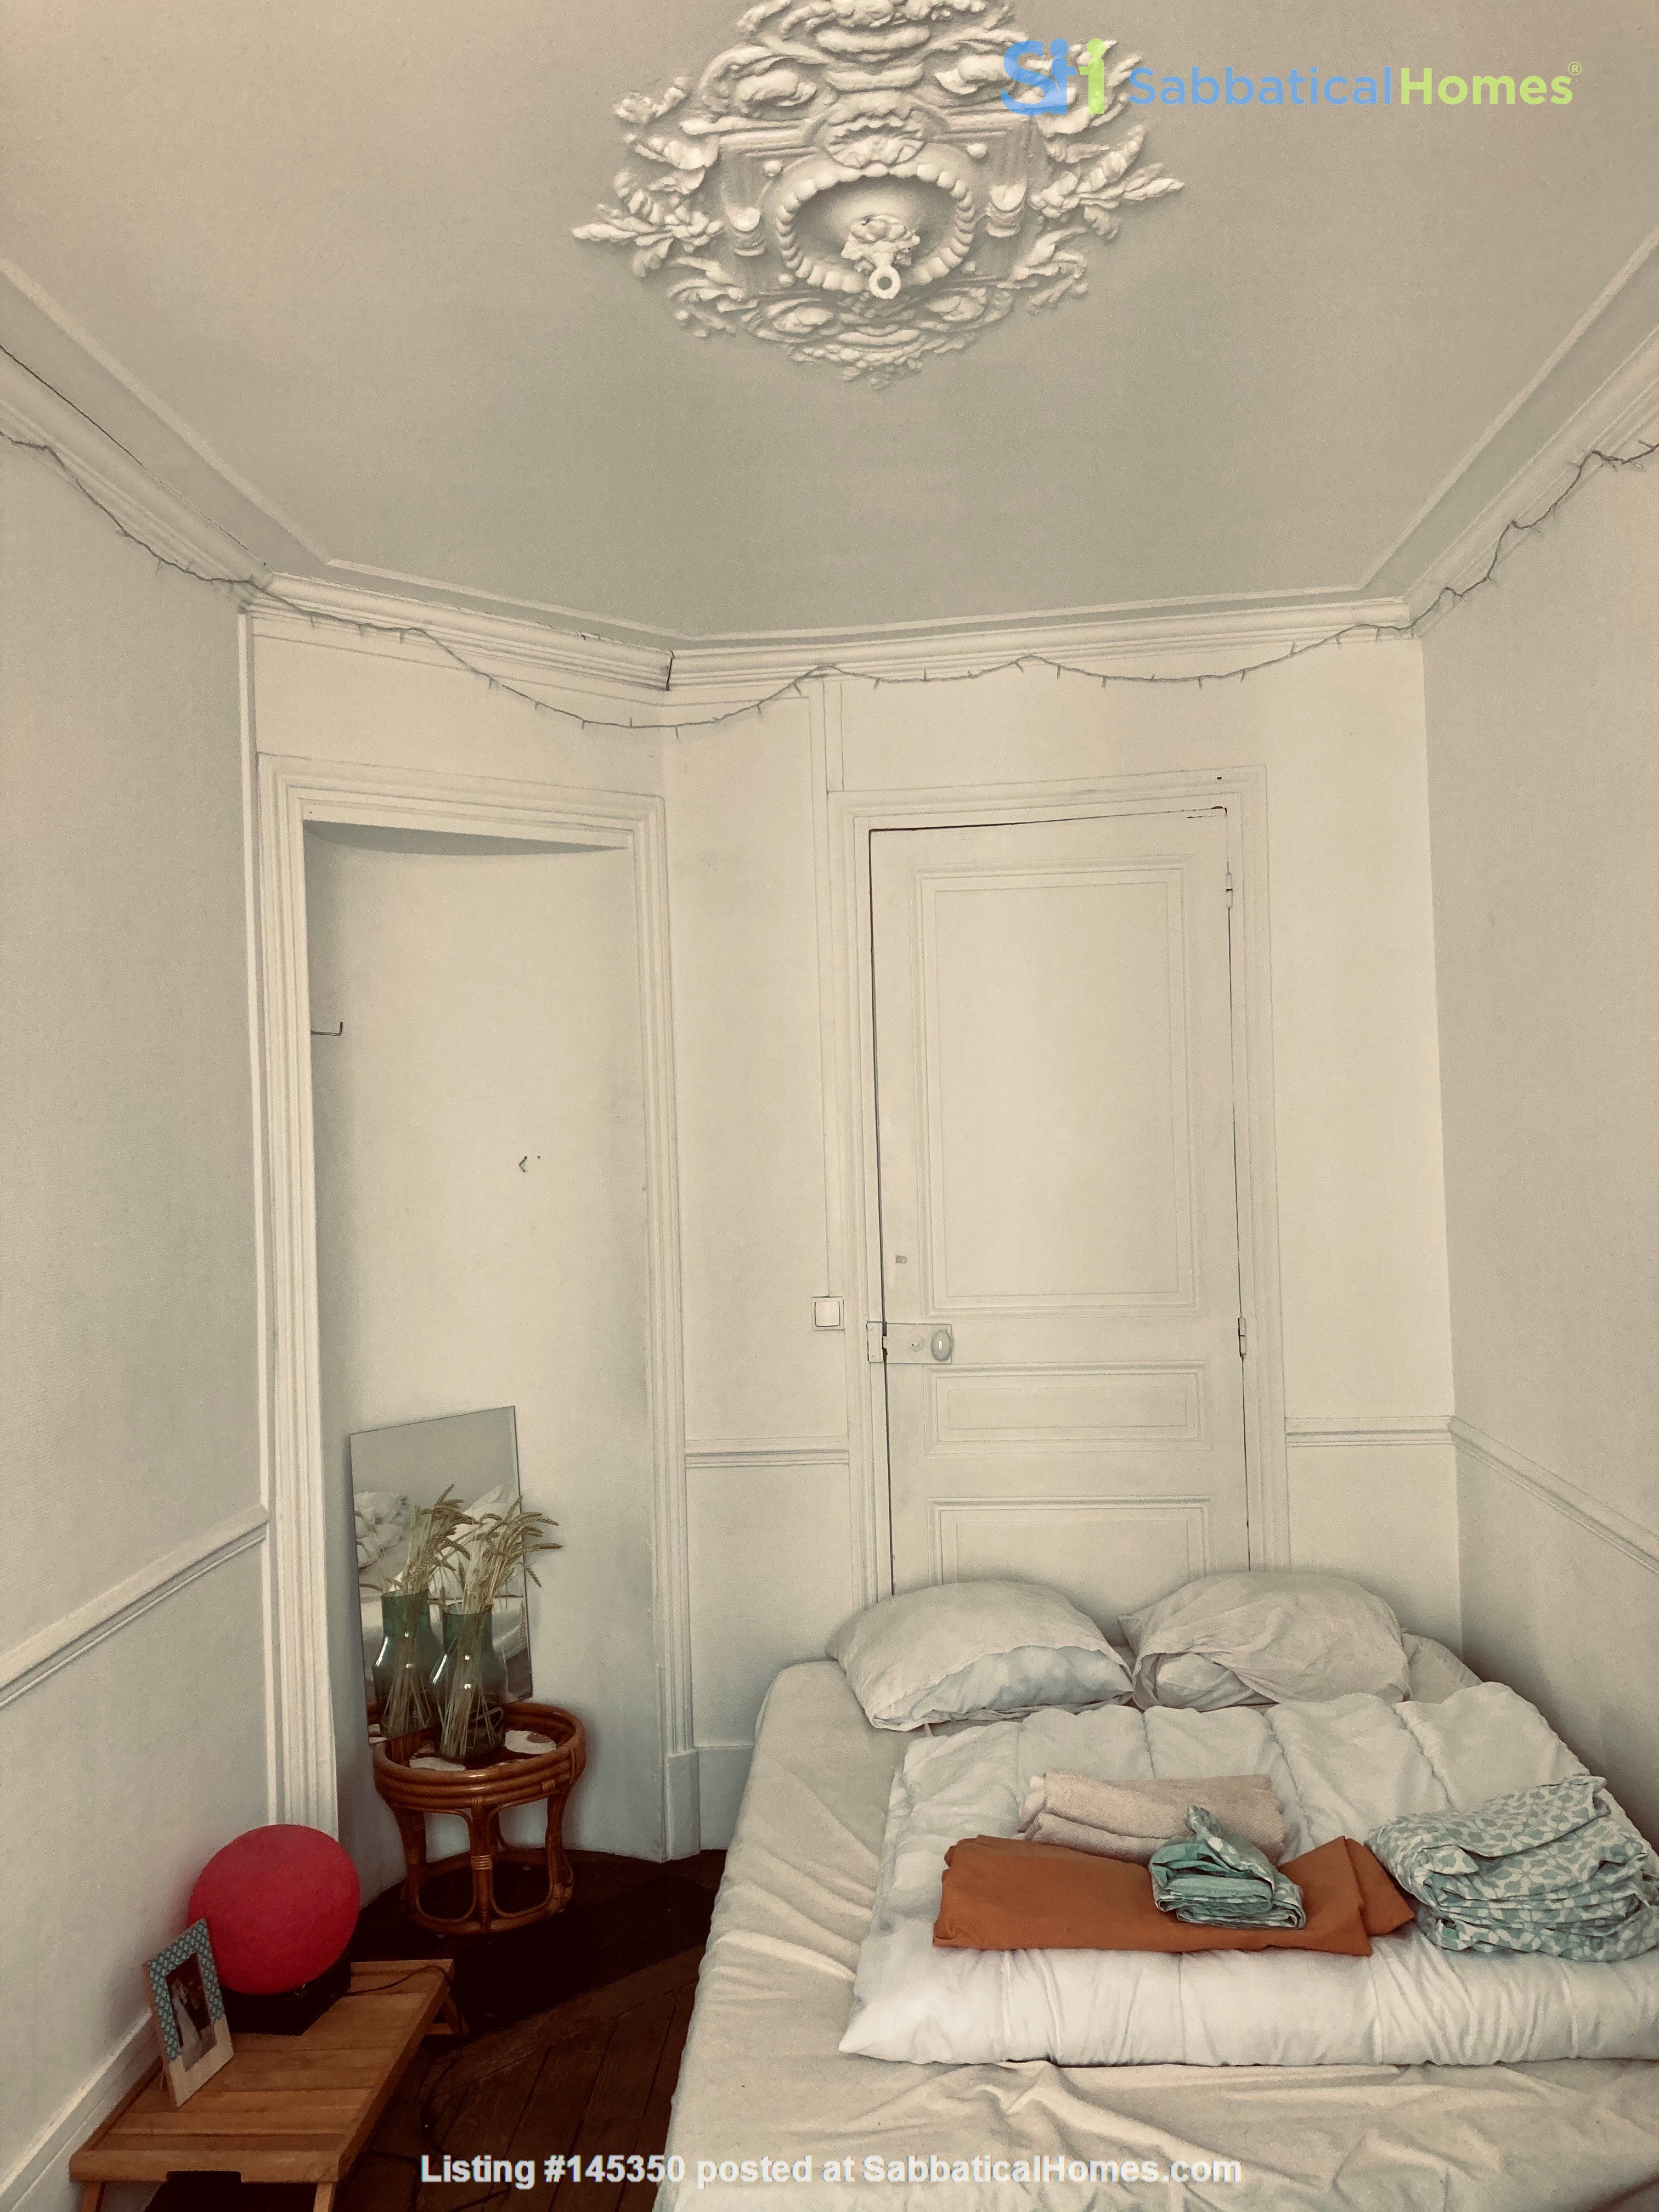 Charming one-bedroom apartment near Montmartre Home Rental in Paris, Île-de-France, France 5